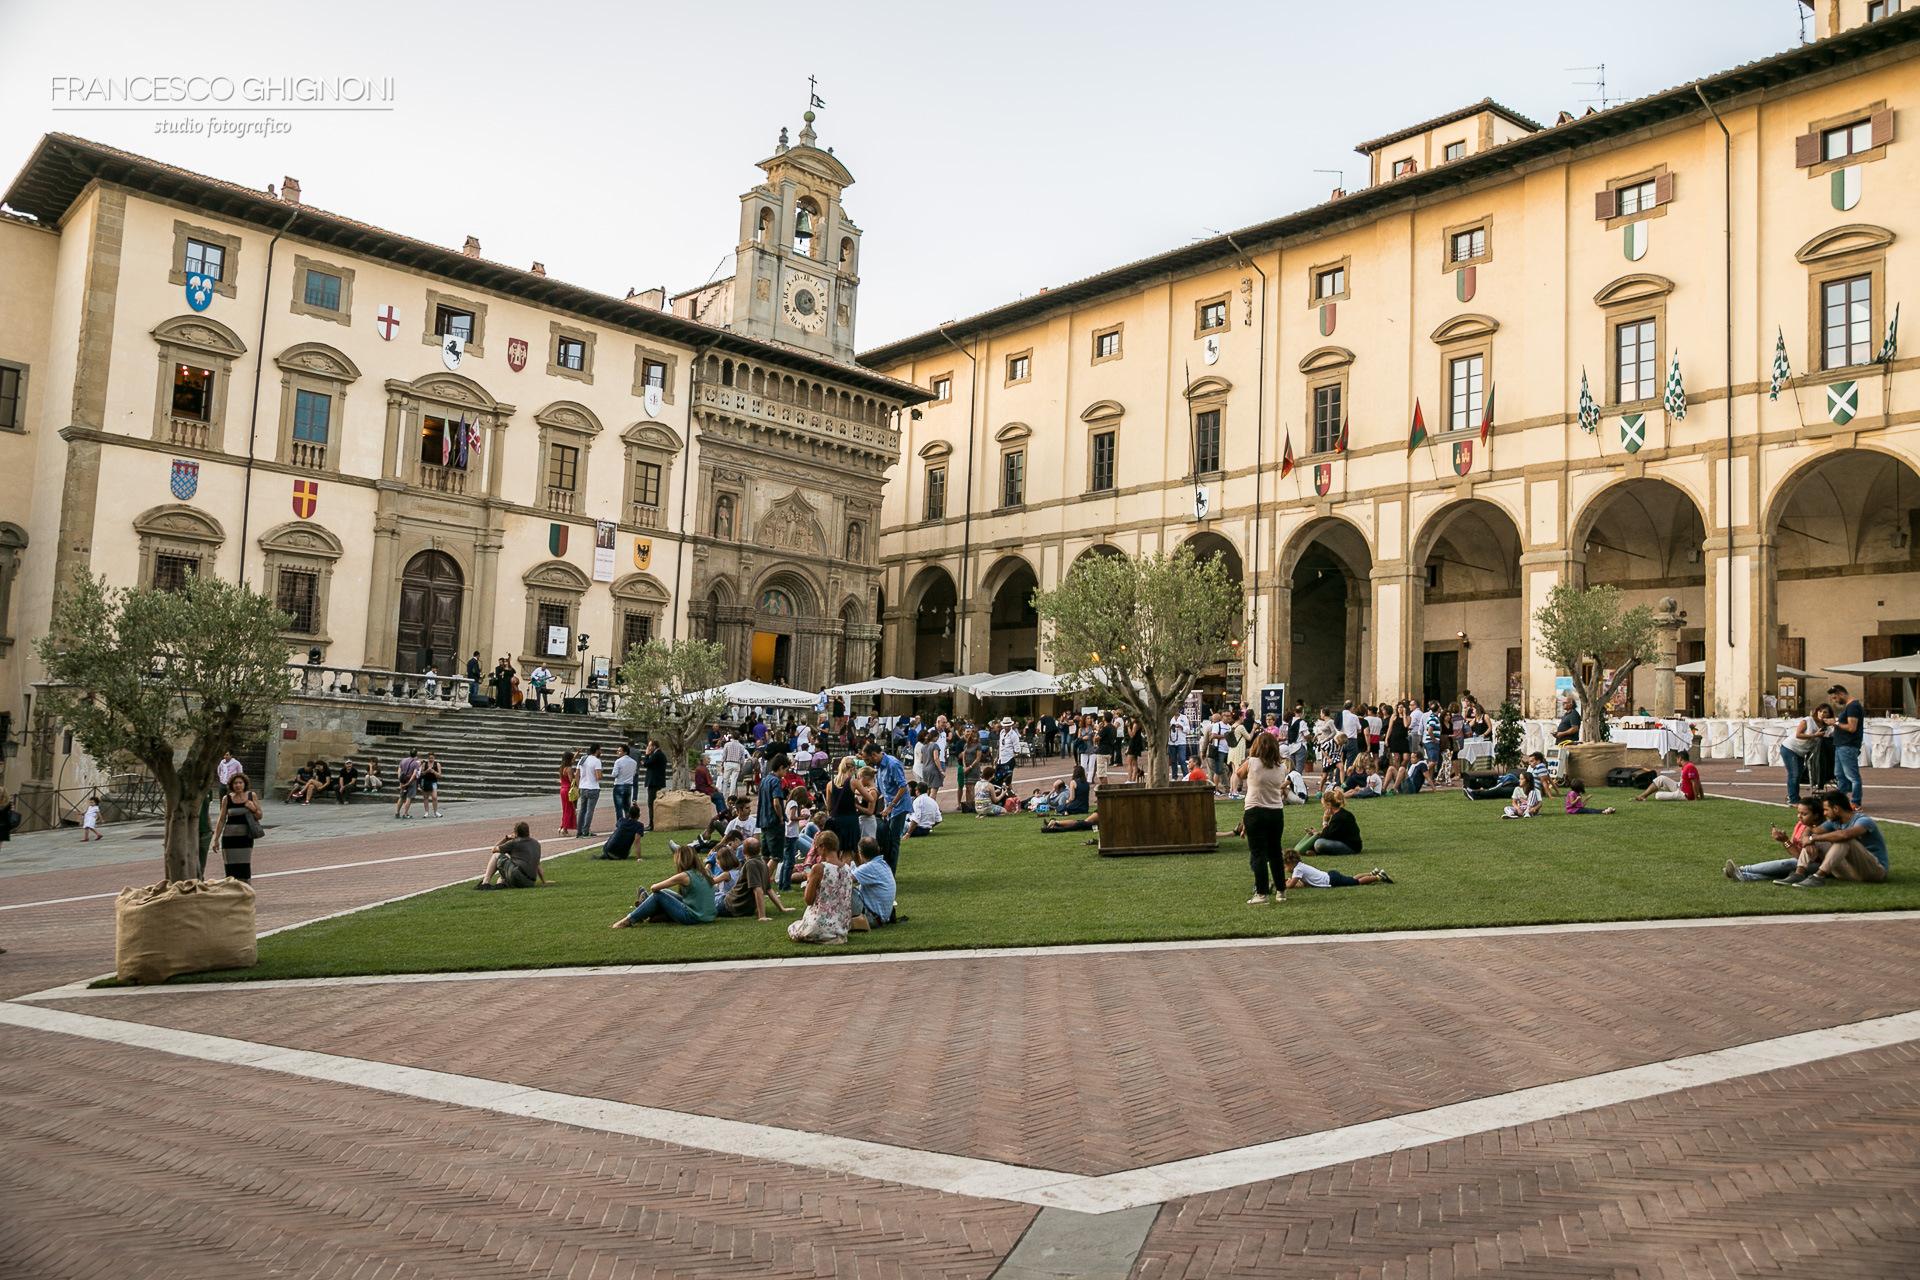 150820193440 - Foto Francesco Ghignoni